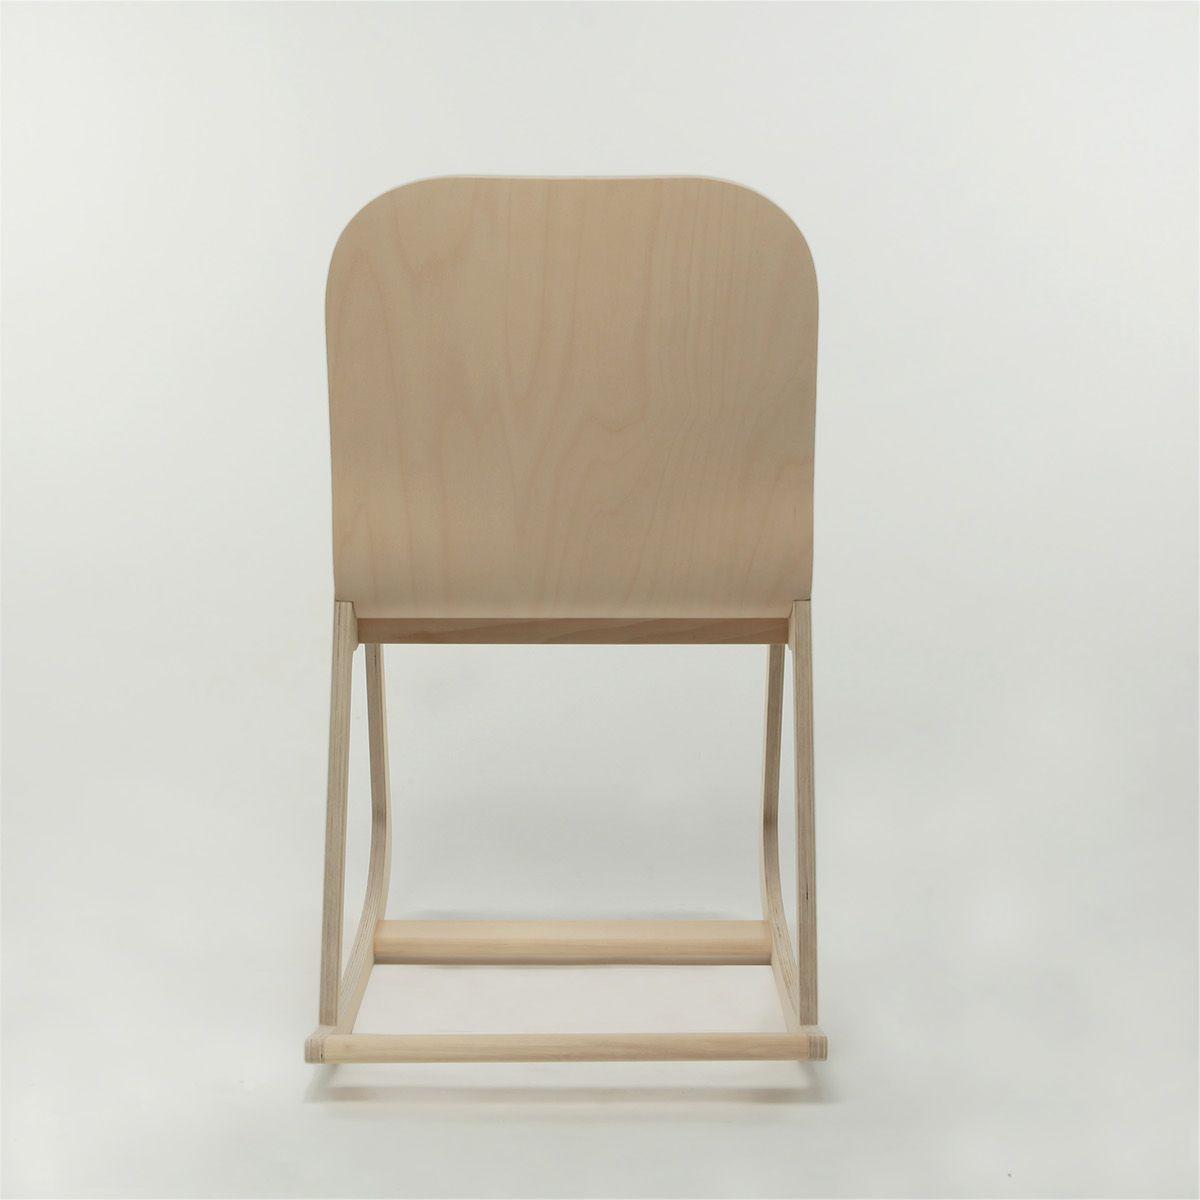 BUJAK Rocking Chair on Behance